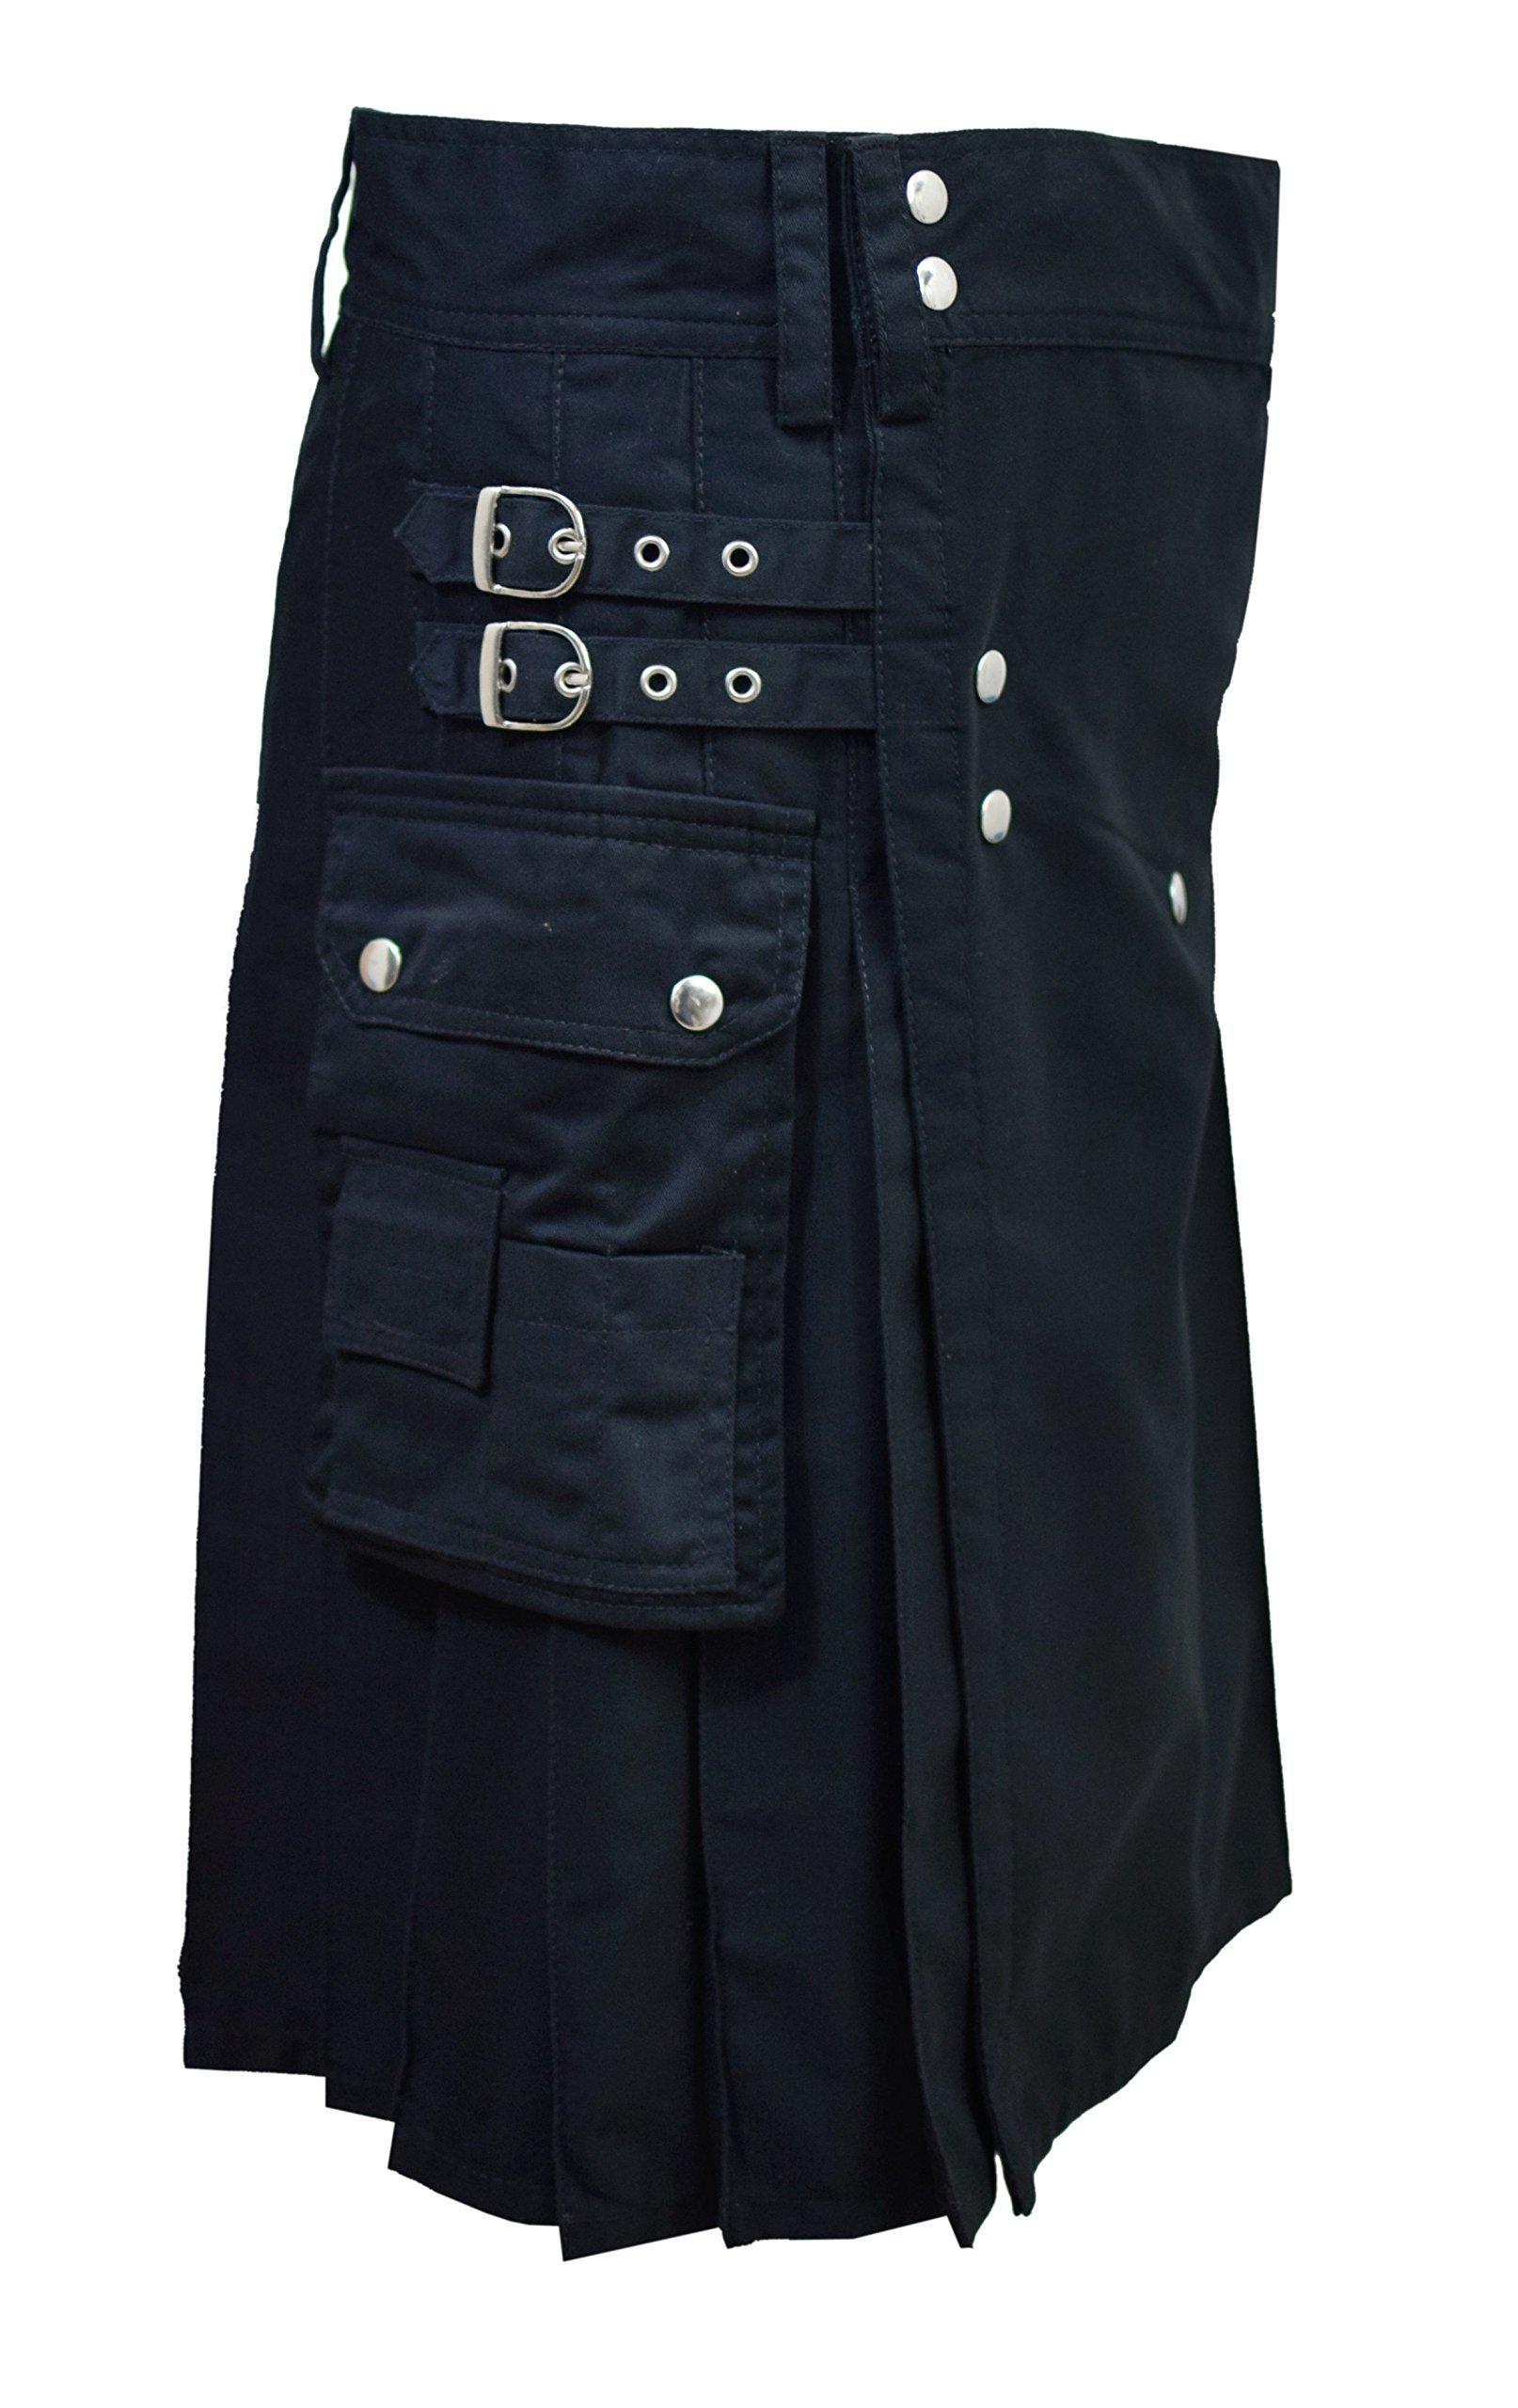 SHYNE Men's Black Fashion Sport Utility Kilt Deluxe Kilt Adjustable Sizes Pocket Kilt (38'') by SHYNE (Image #2)